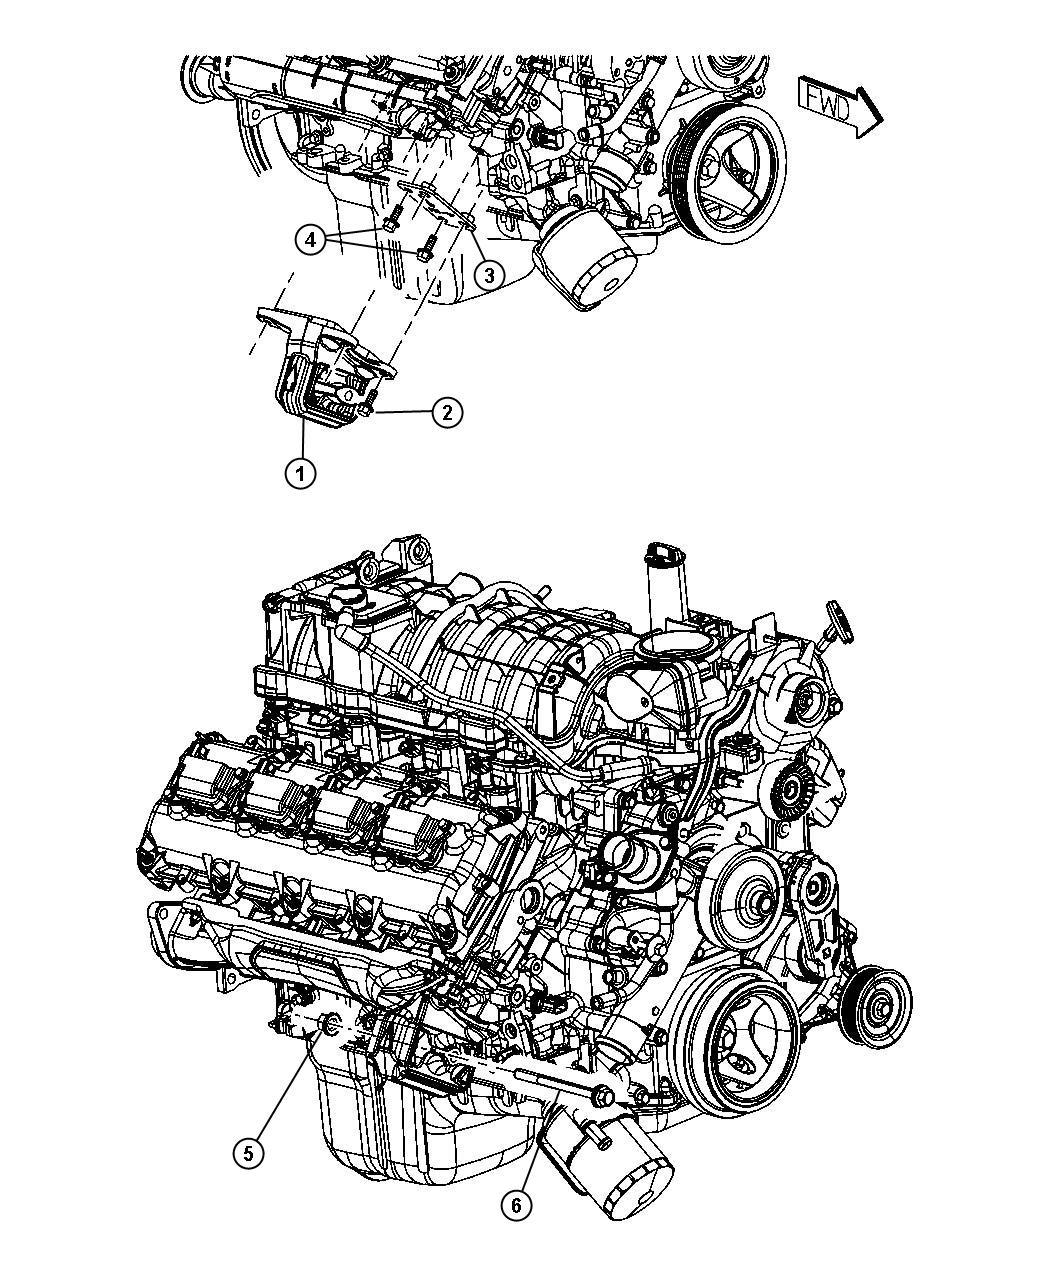 2012 Dodge Ram 2500 Insulator. Engine mount. Right side